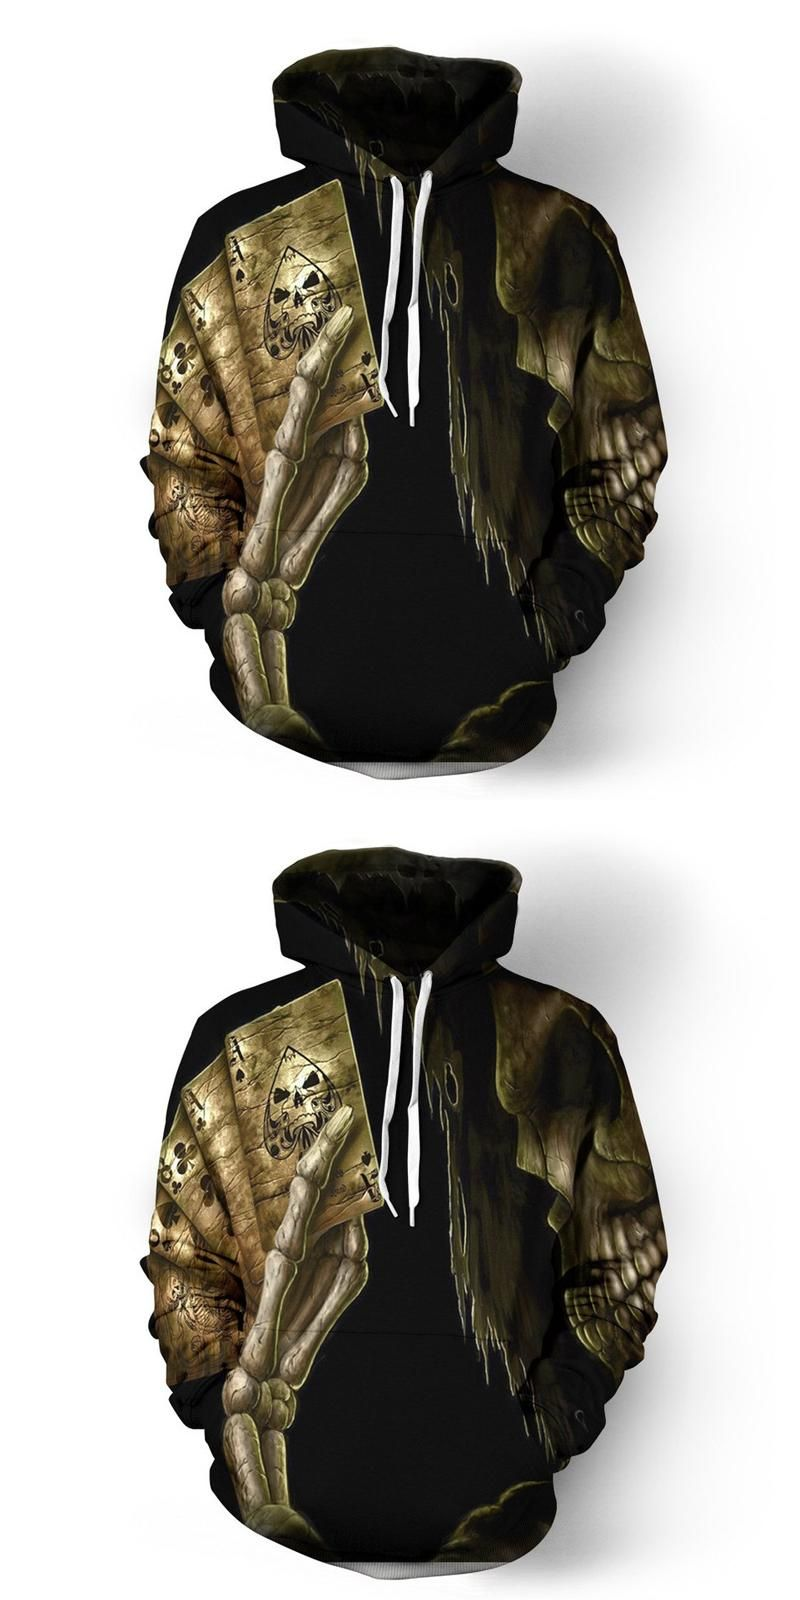 2017 new fashion Cool sweatshirt Hoodies Men women 3D print Skull Play the  card fashion hot 964d4028c82